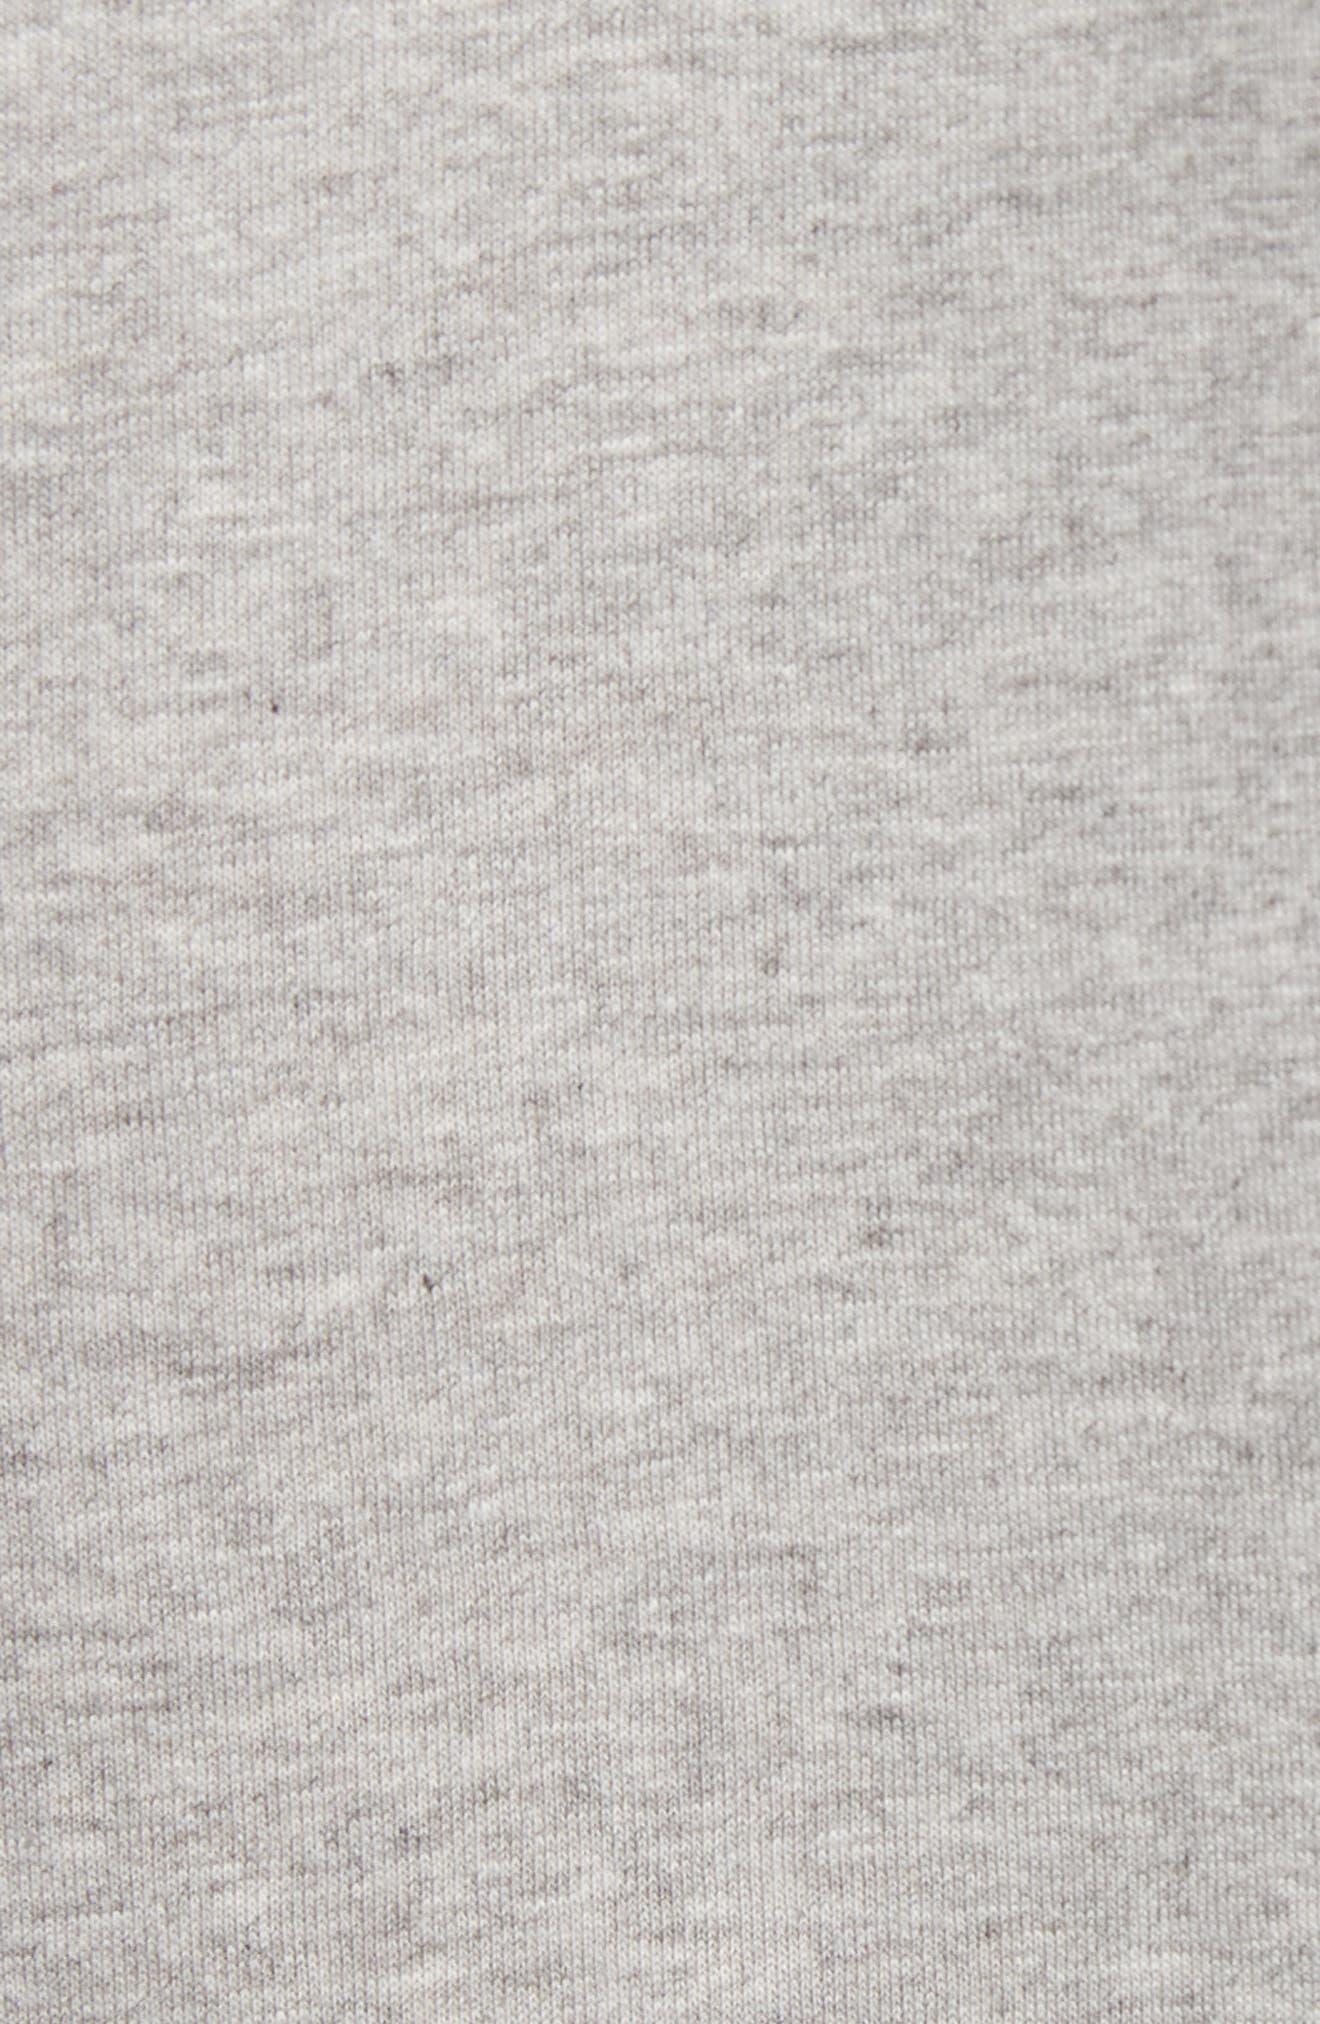 Orcher Full Sleeve Sweatshirt,                             Alternate thumbnail 14, color,